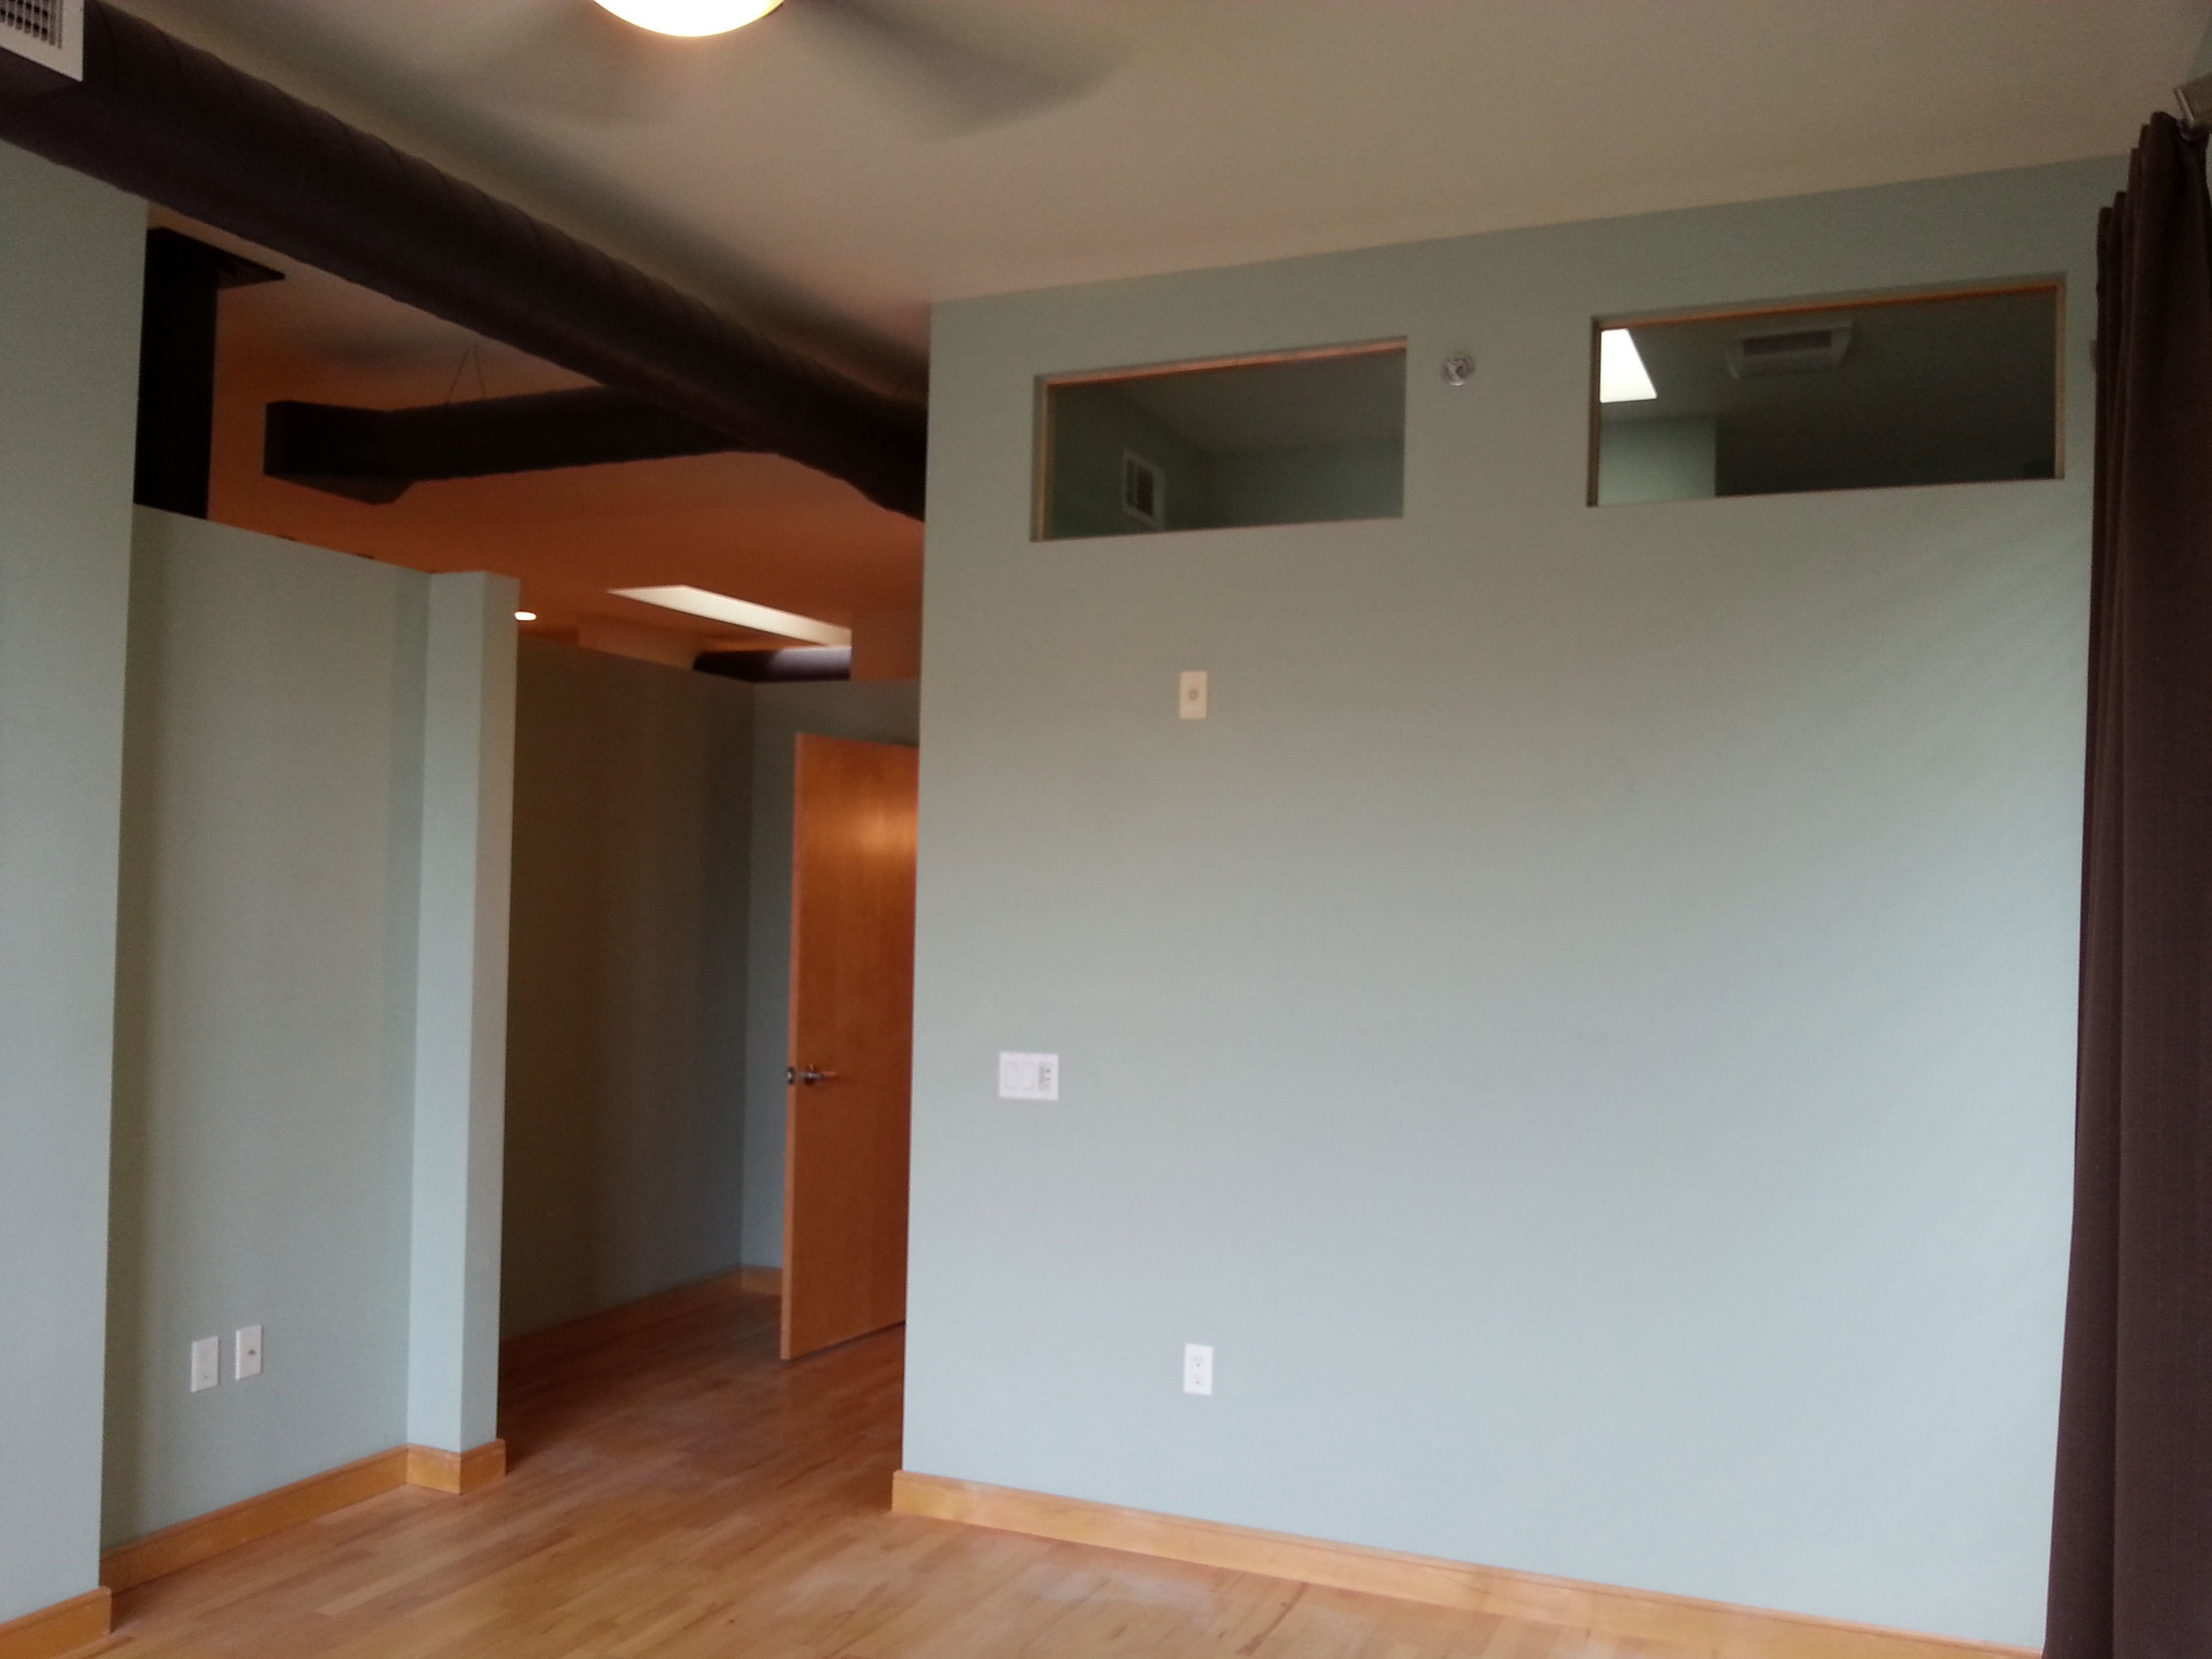 megna-painting-4th-ward-lofts.jpg